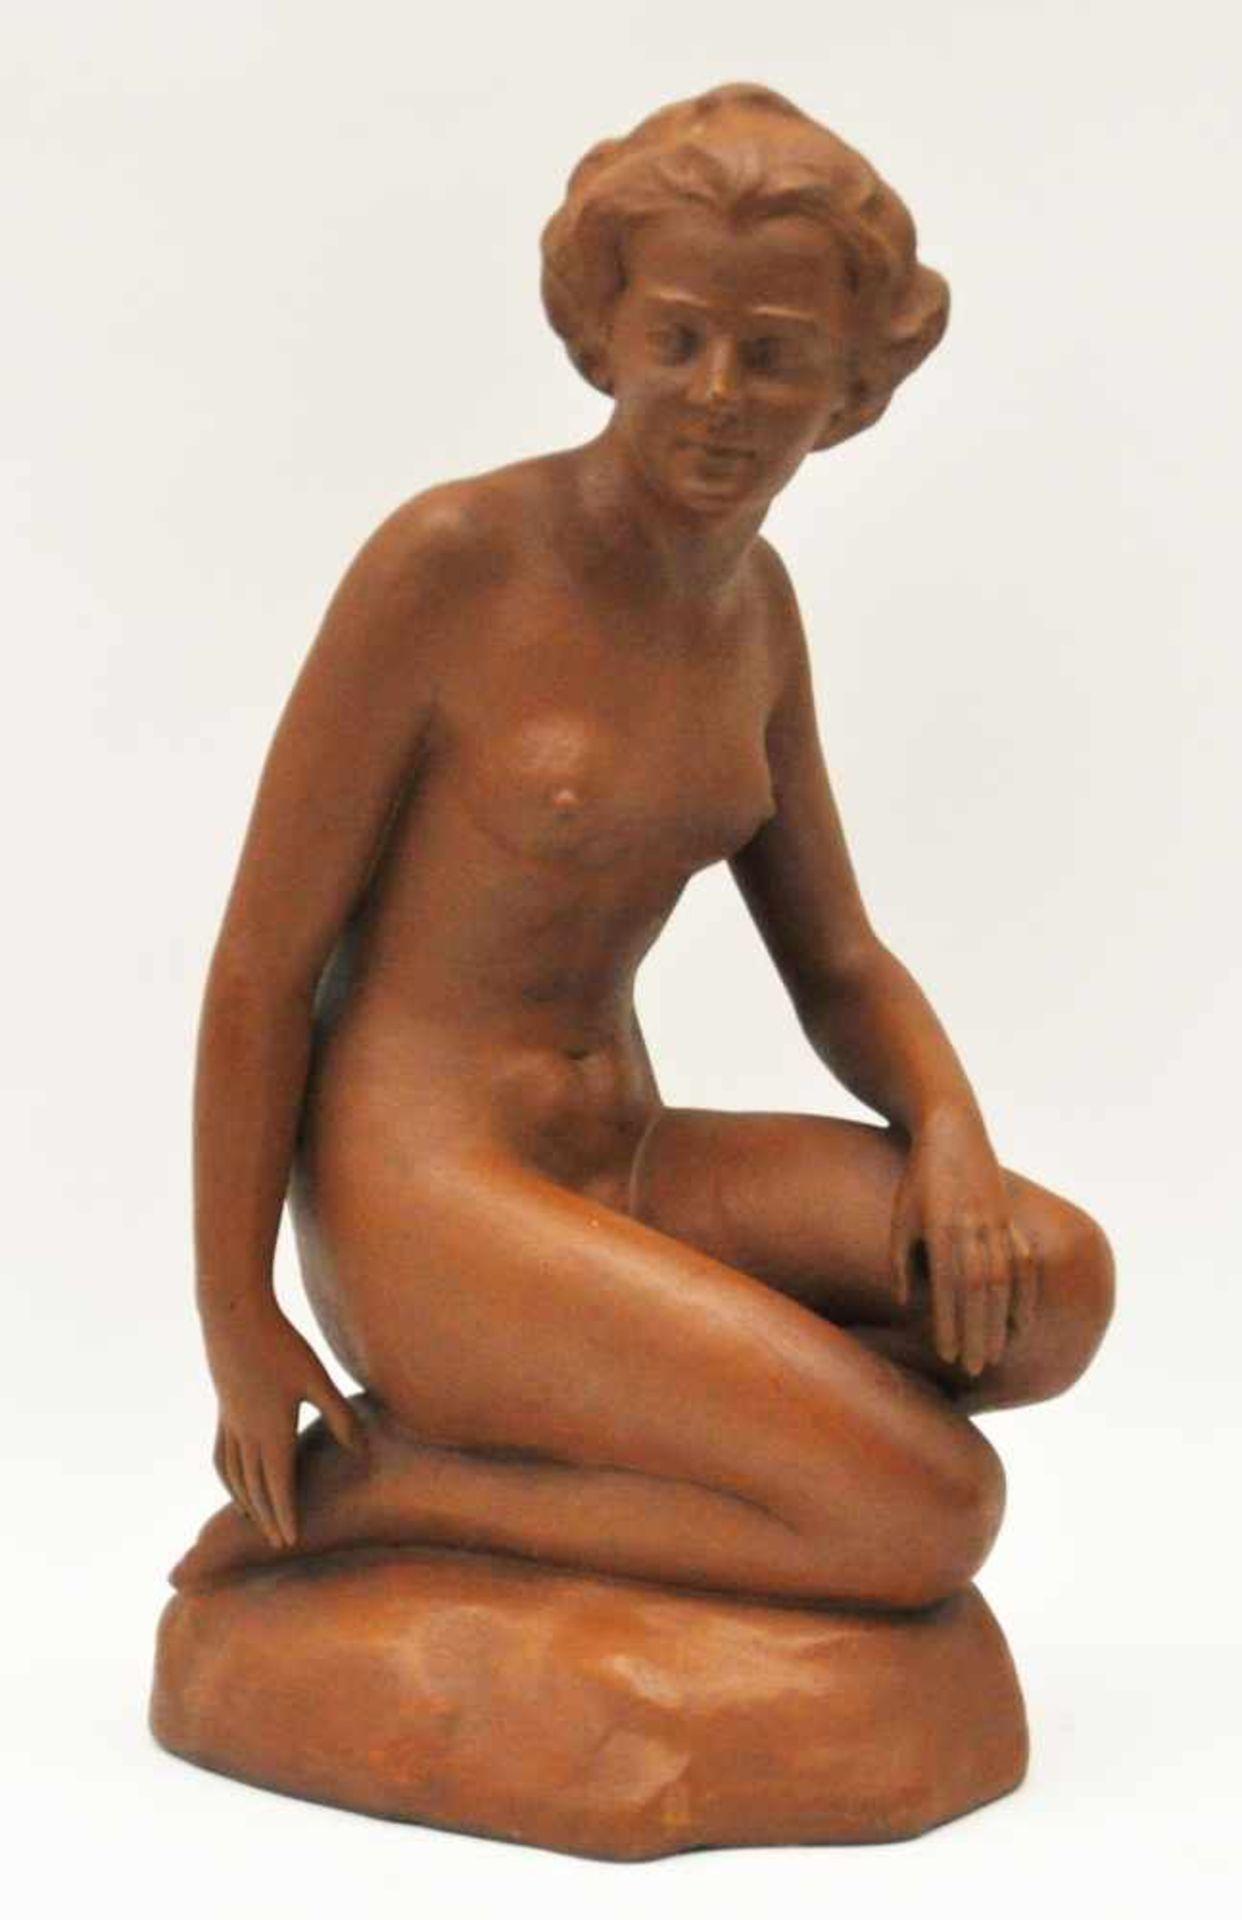 "Pörtzel, Otto (1876 – 1963),""Kniender Akt"", Terracotta, Höhe 42 cm, im Sockel signiert"